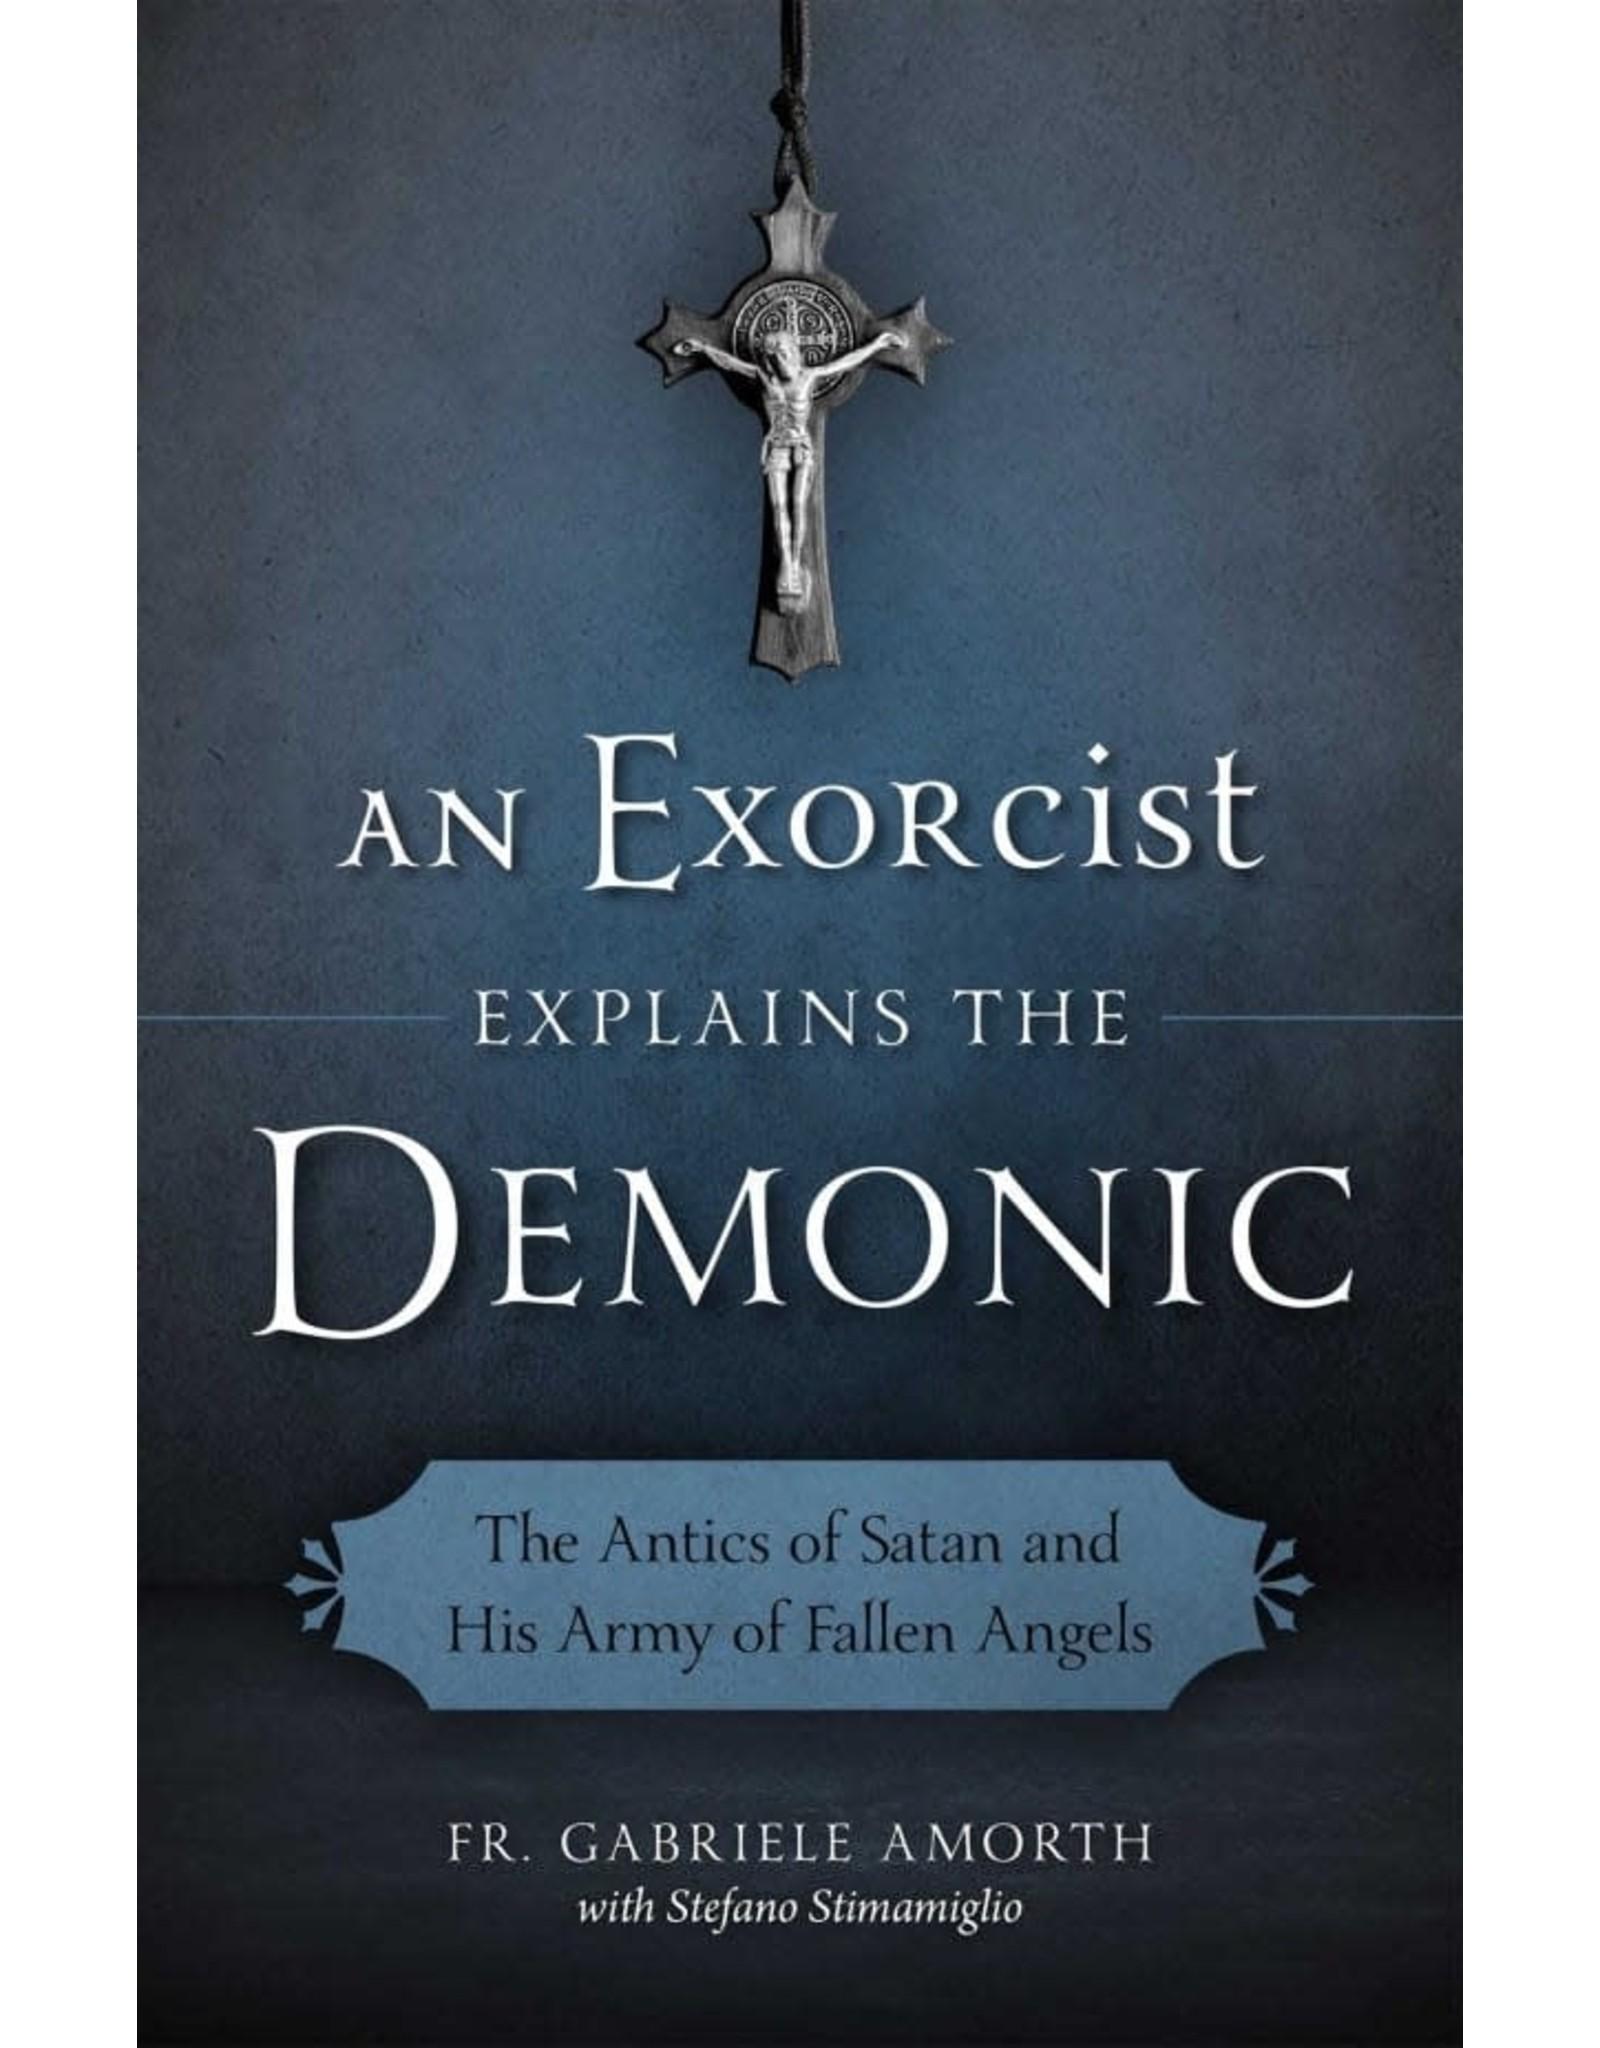 An Exorcist Explains the Demonic by Fr. Gabriele Amorth